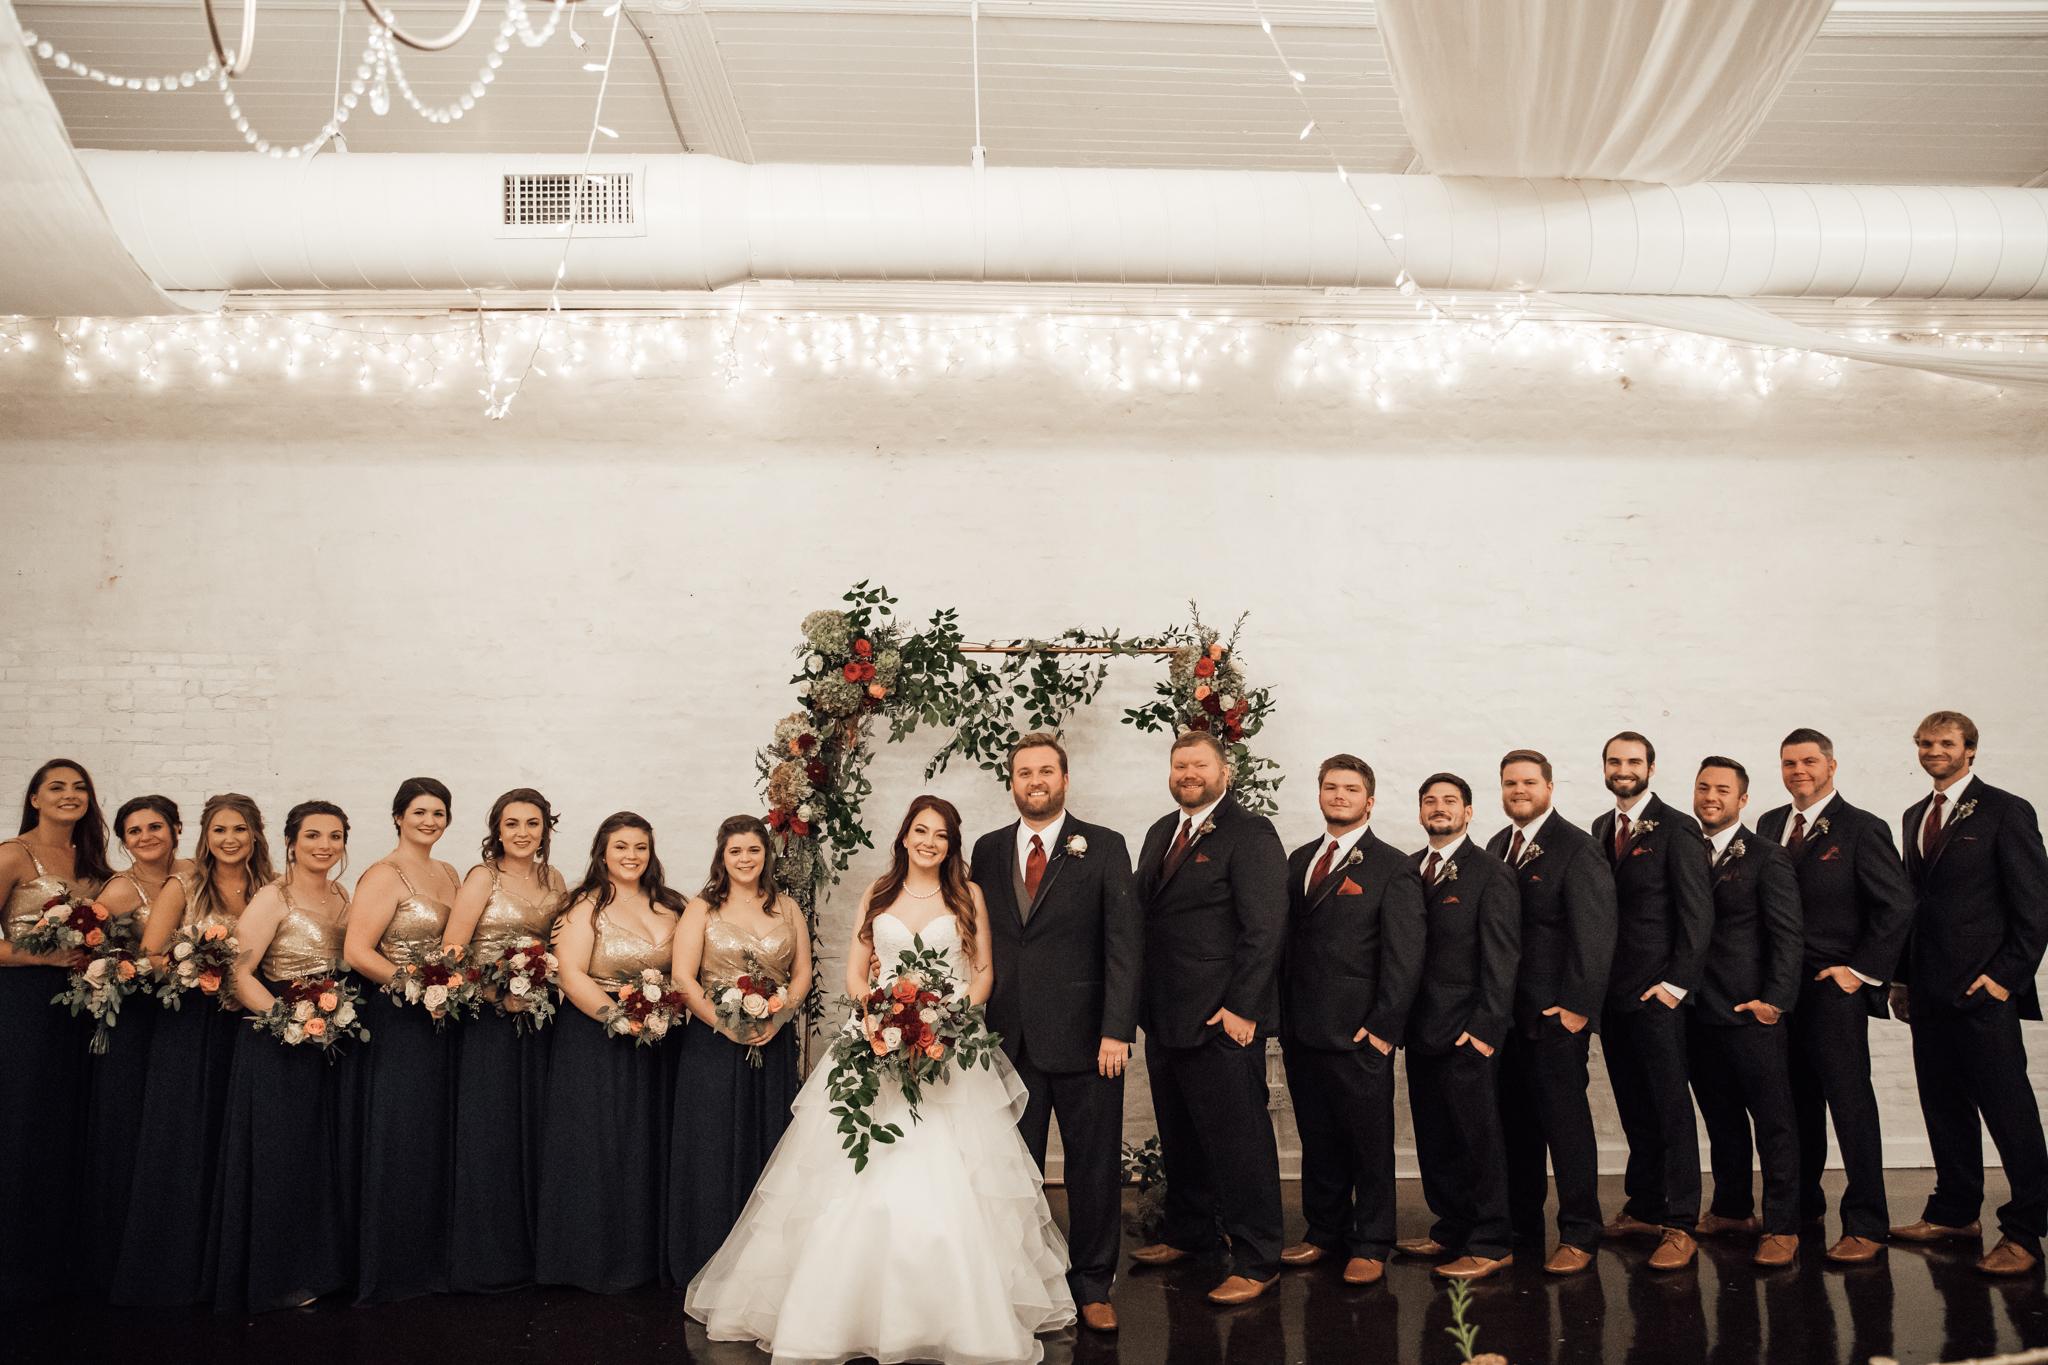 memphis-wedding-photographers-thewarmtharoundyou-ballinese-ballroom (173 of 232).jpg